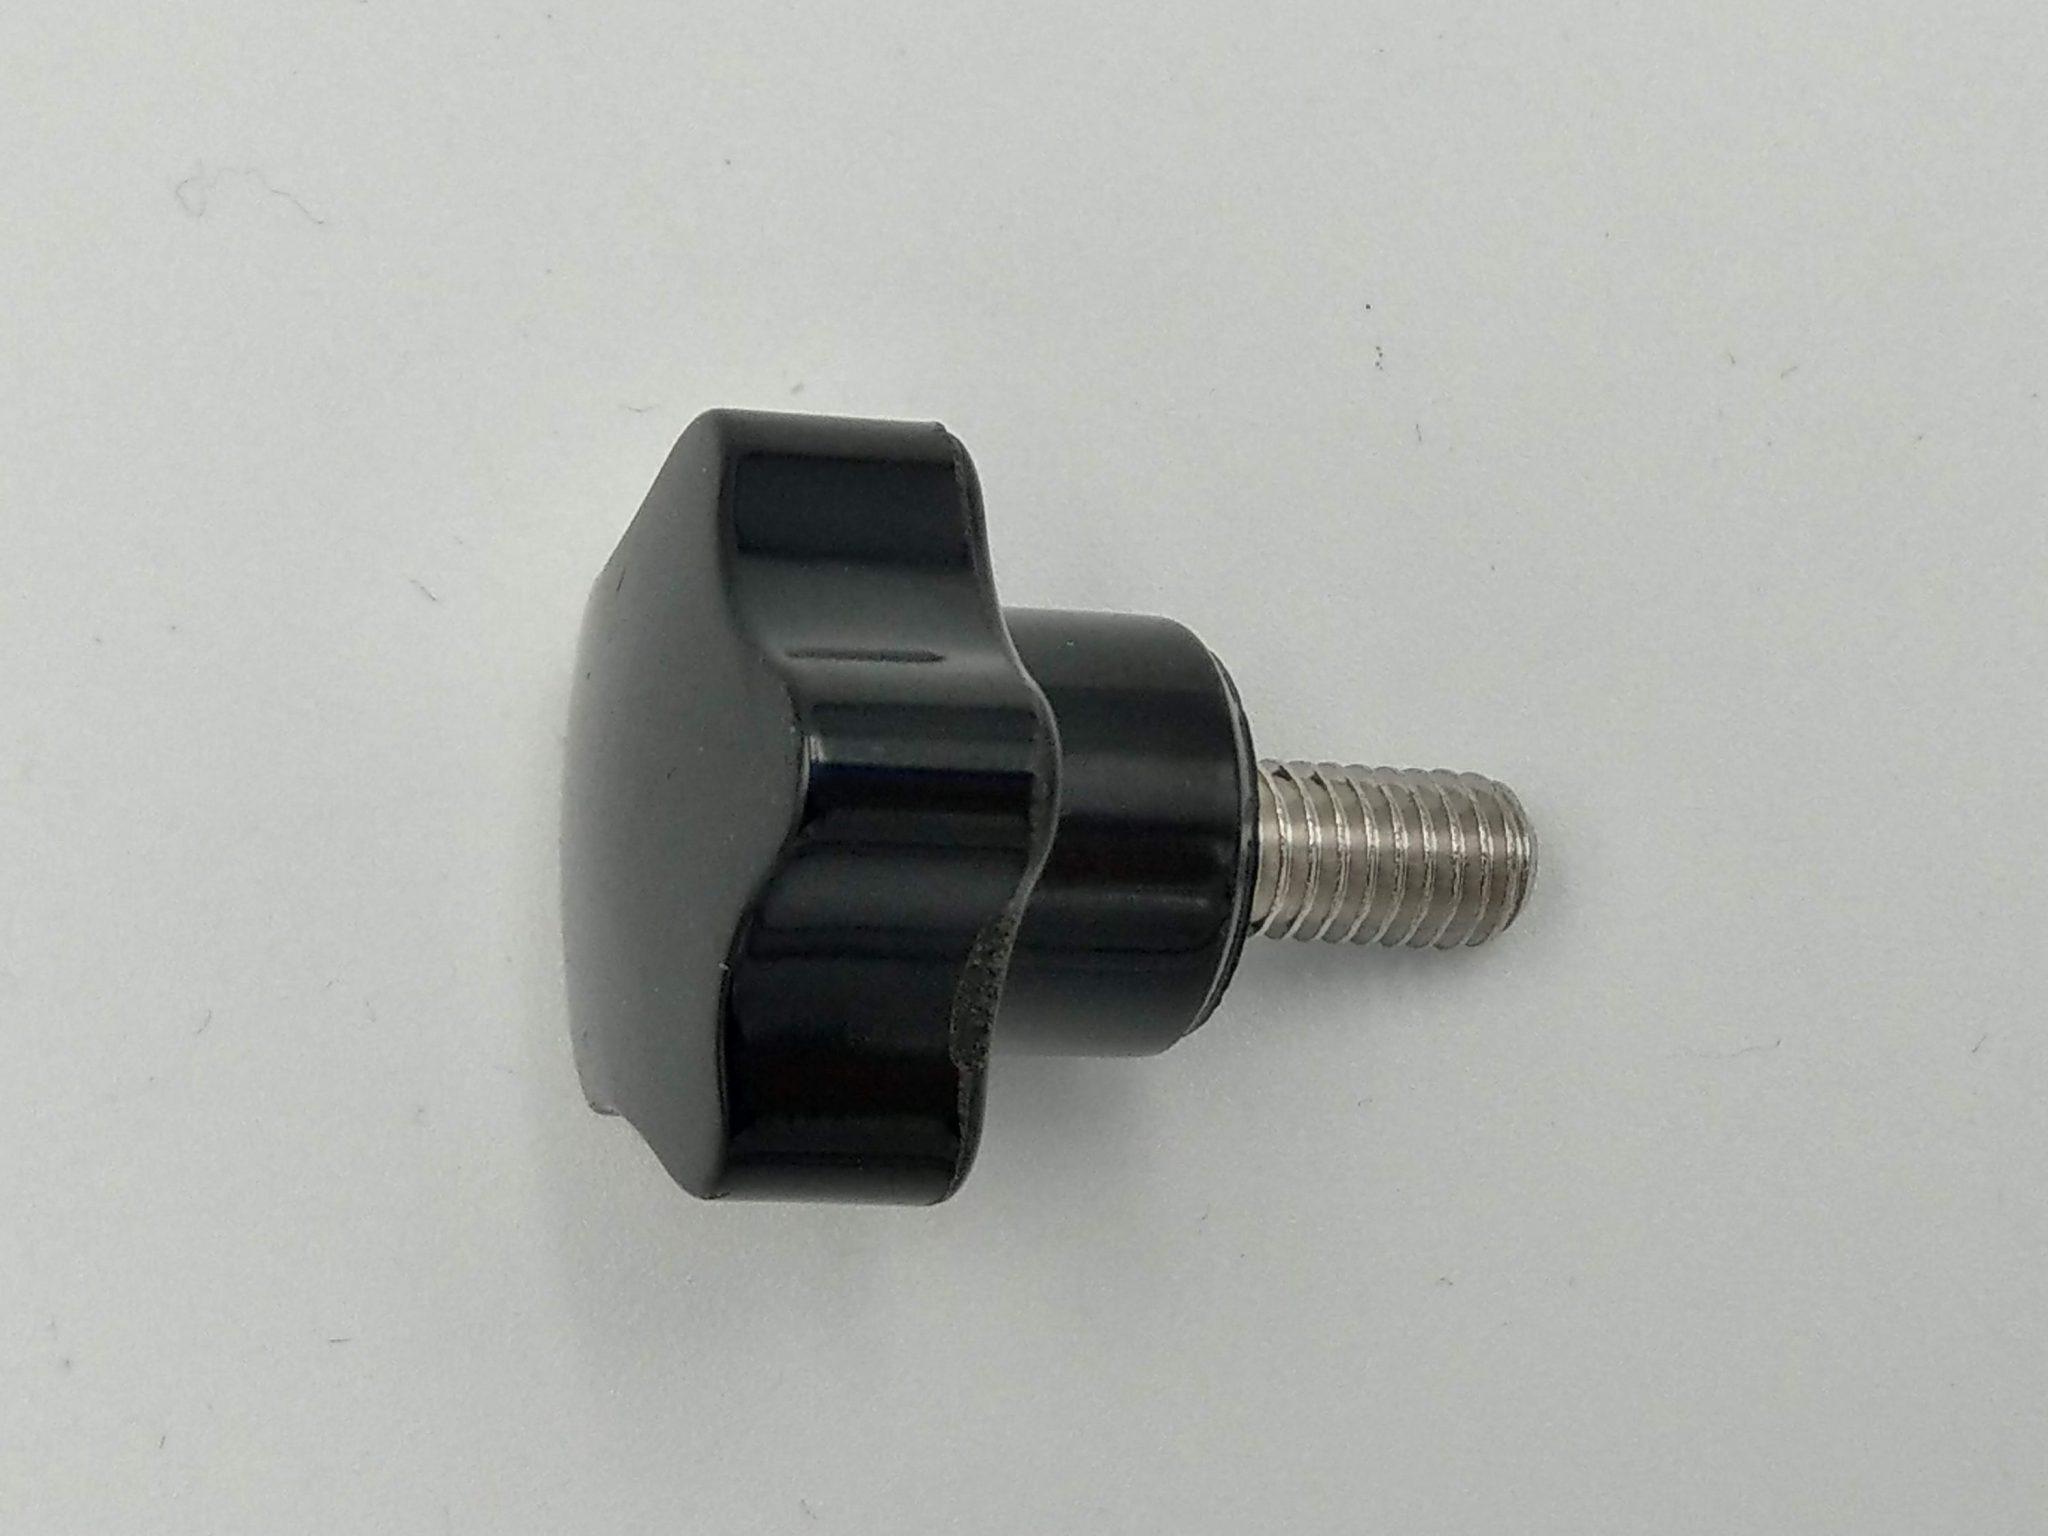 Creality LD-001 Thumbscrews